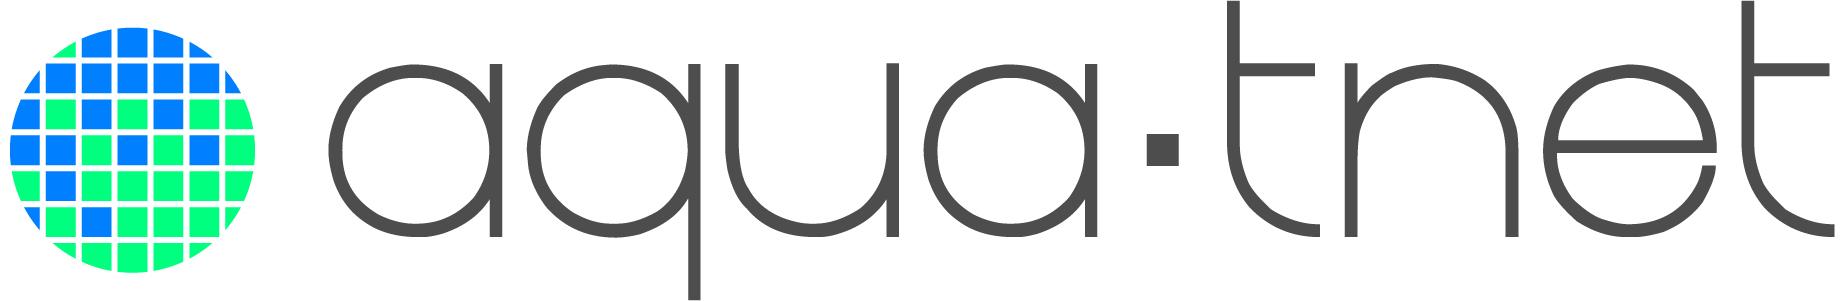 aquatnet logo-cmyk